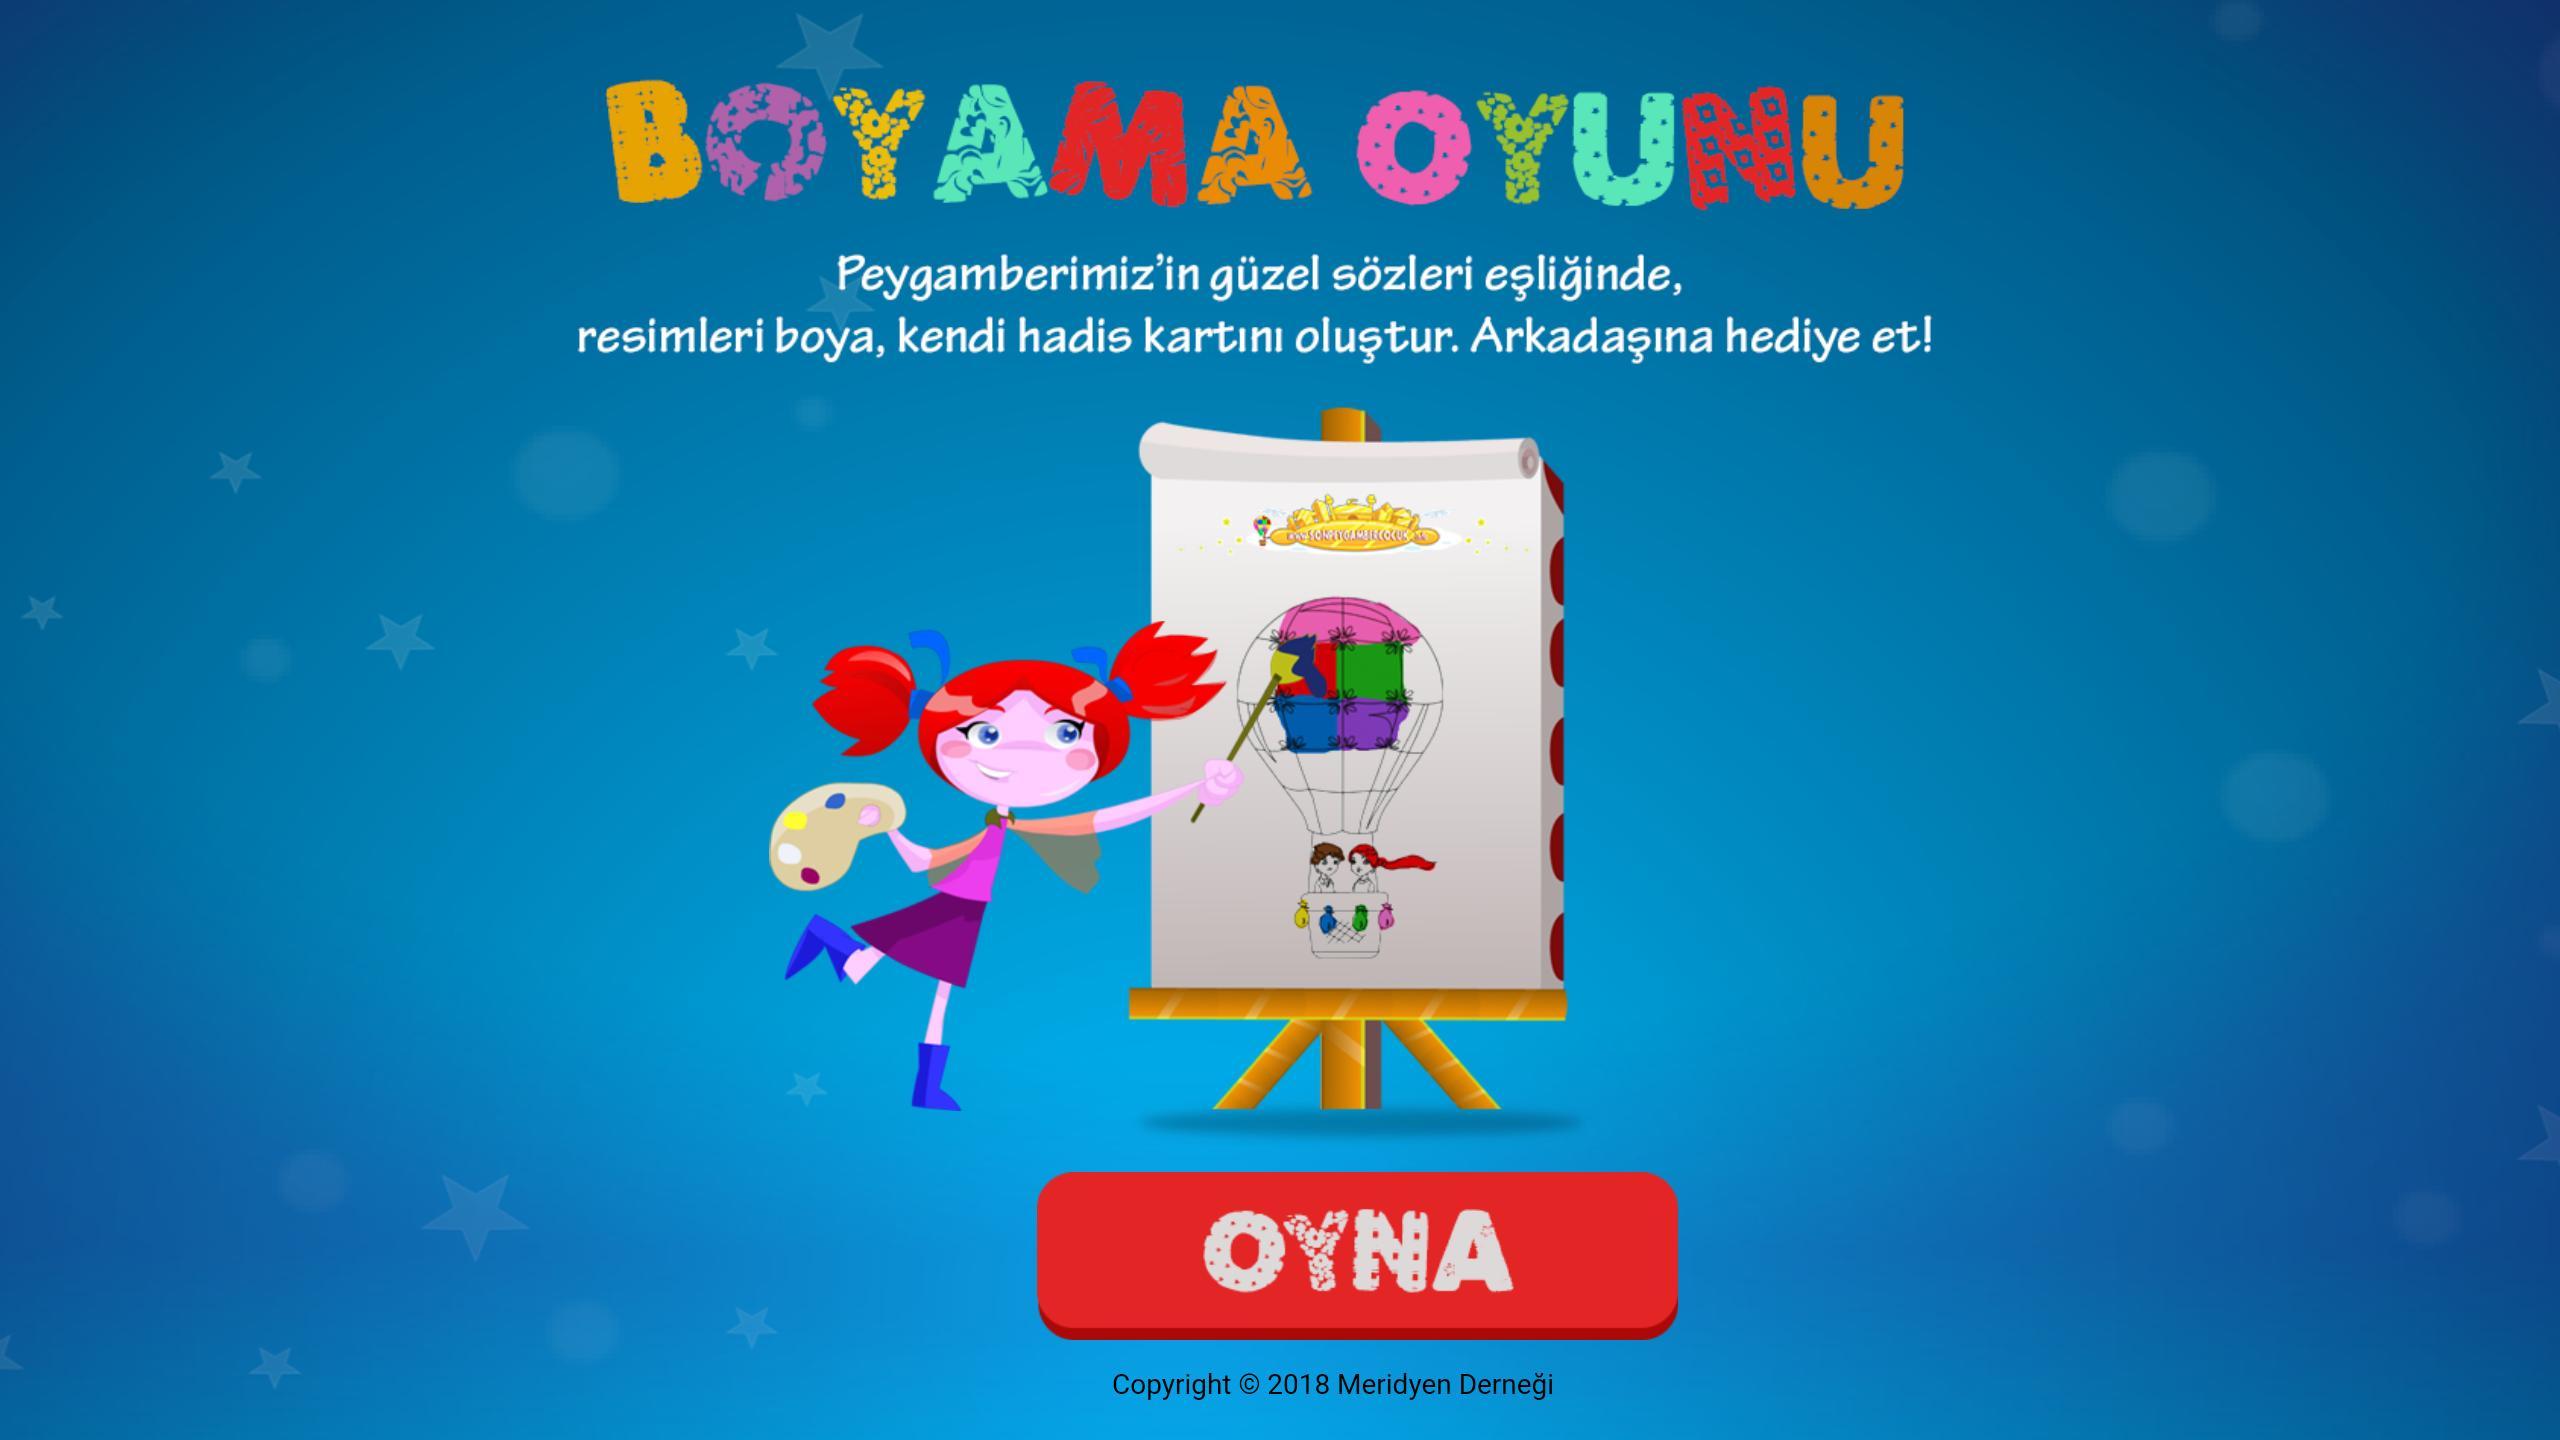 Hadisli Boyama Oyunu For Android Apk Download